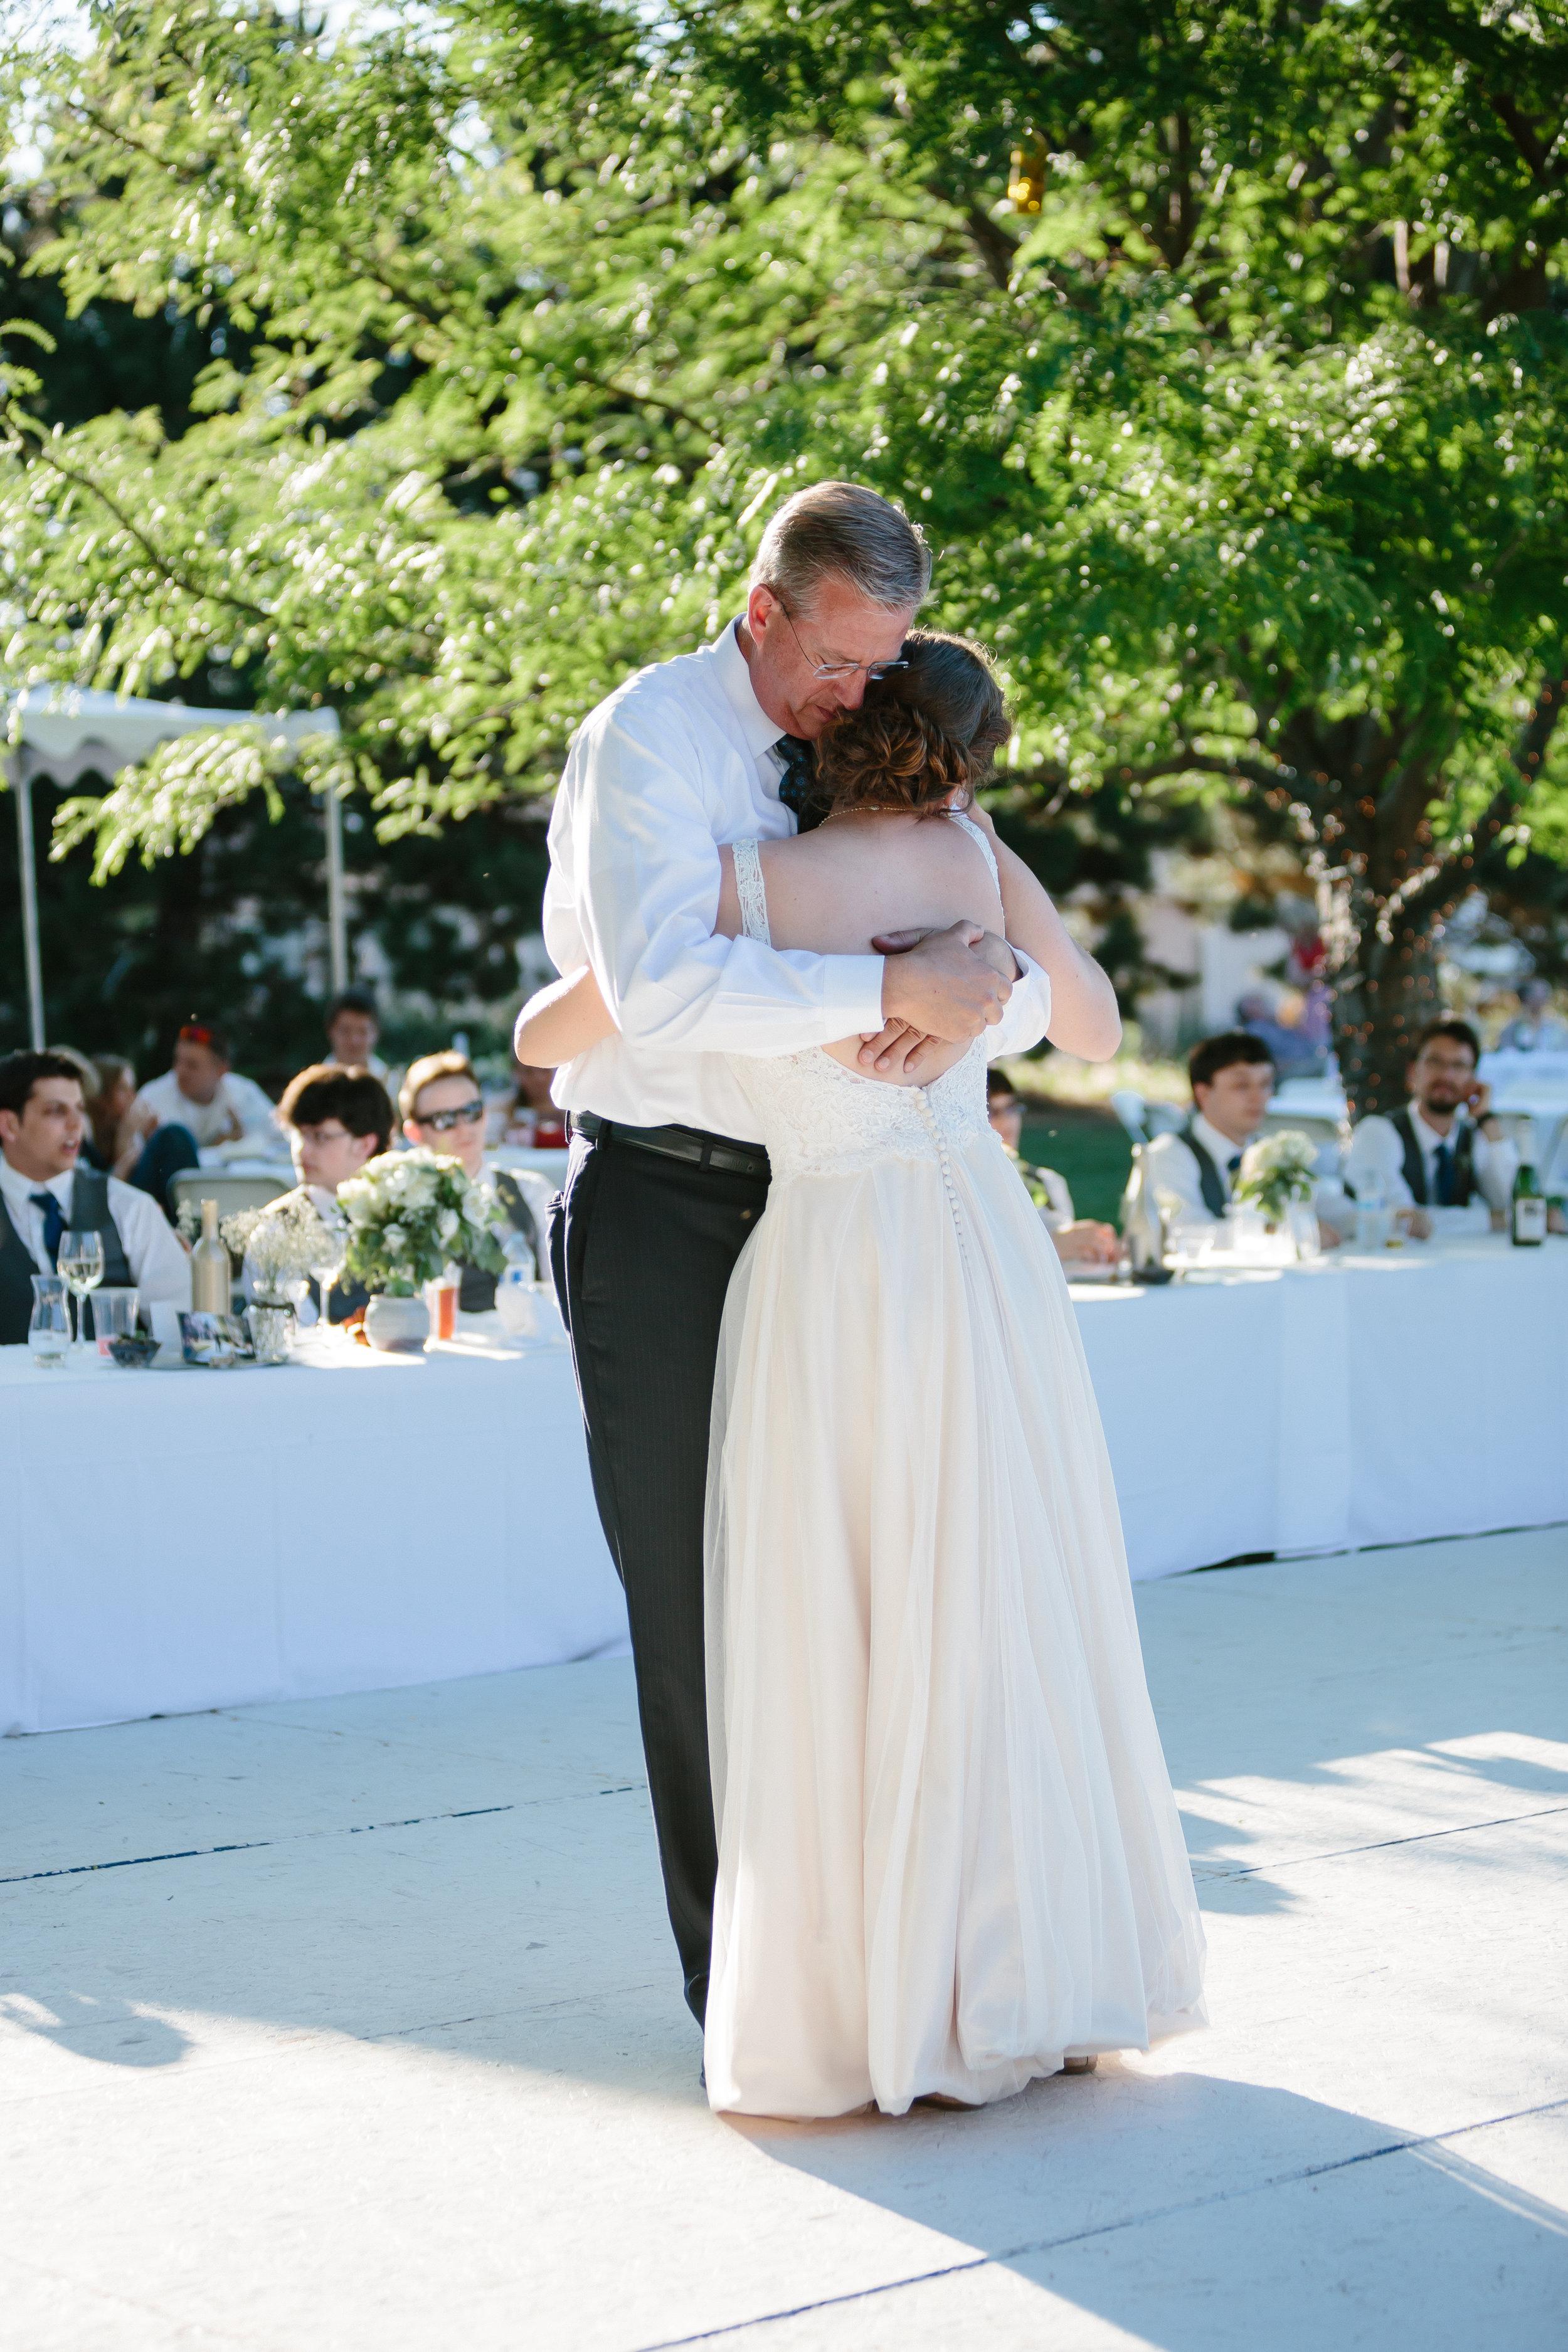 Jordan & Shantel Married - Idaho - Corrie Mick Photography-301.jpg